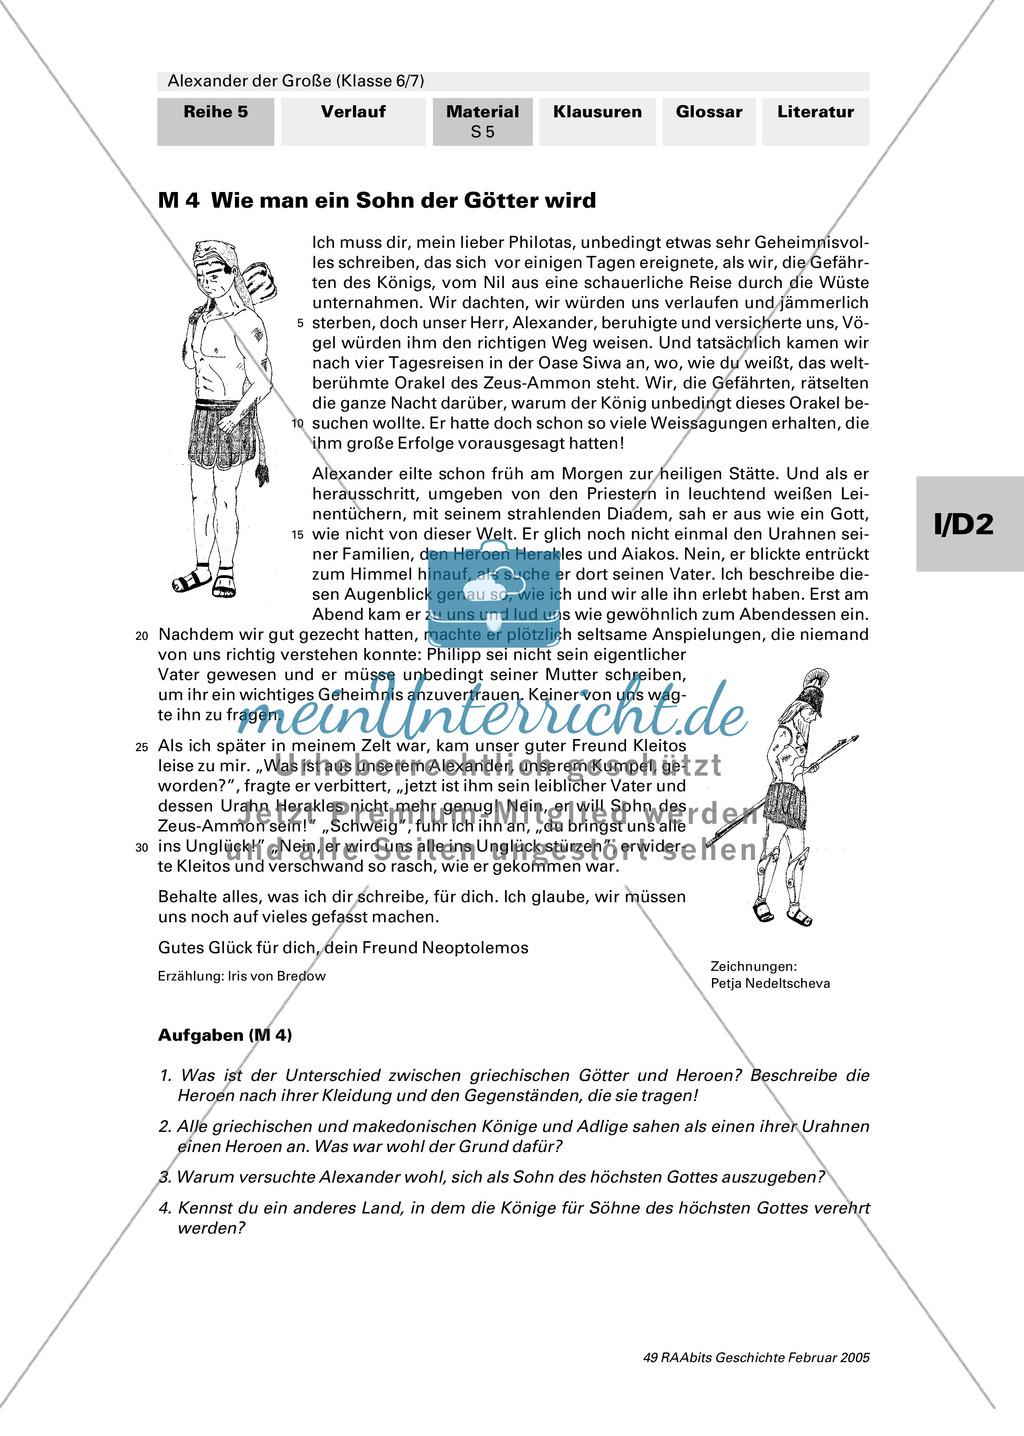 Alexander der Große: Eroberungsfeldzüge an Autorentexten, Karten, Bildern Preview 0